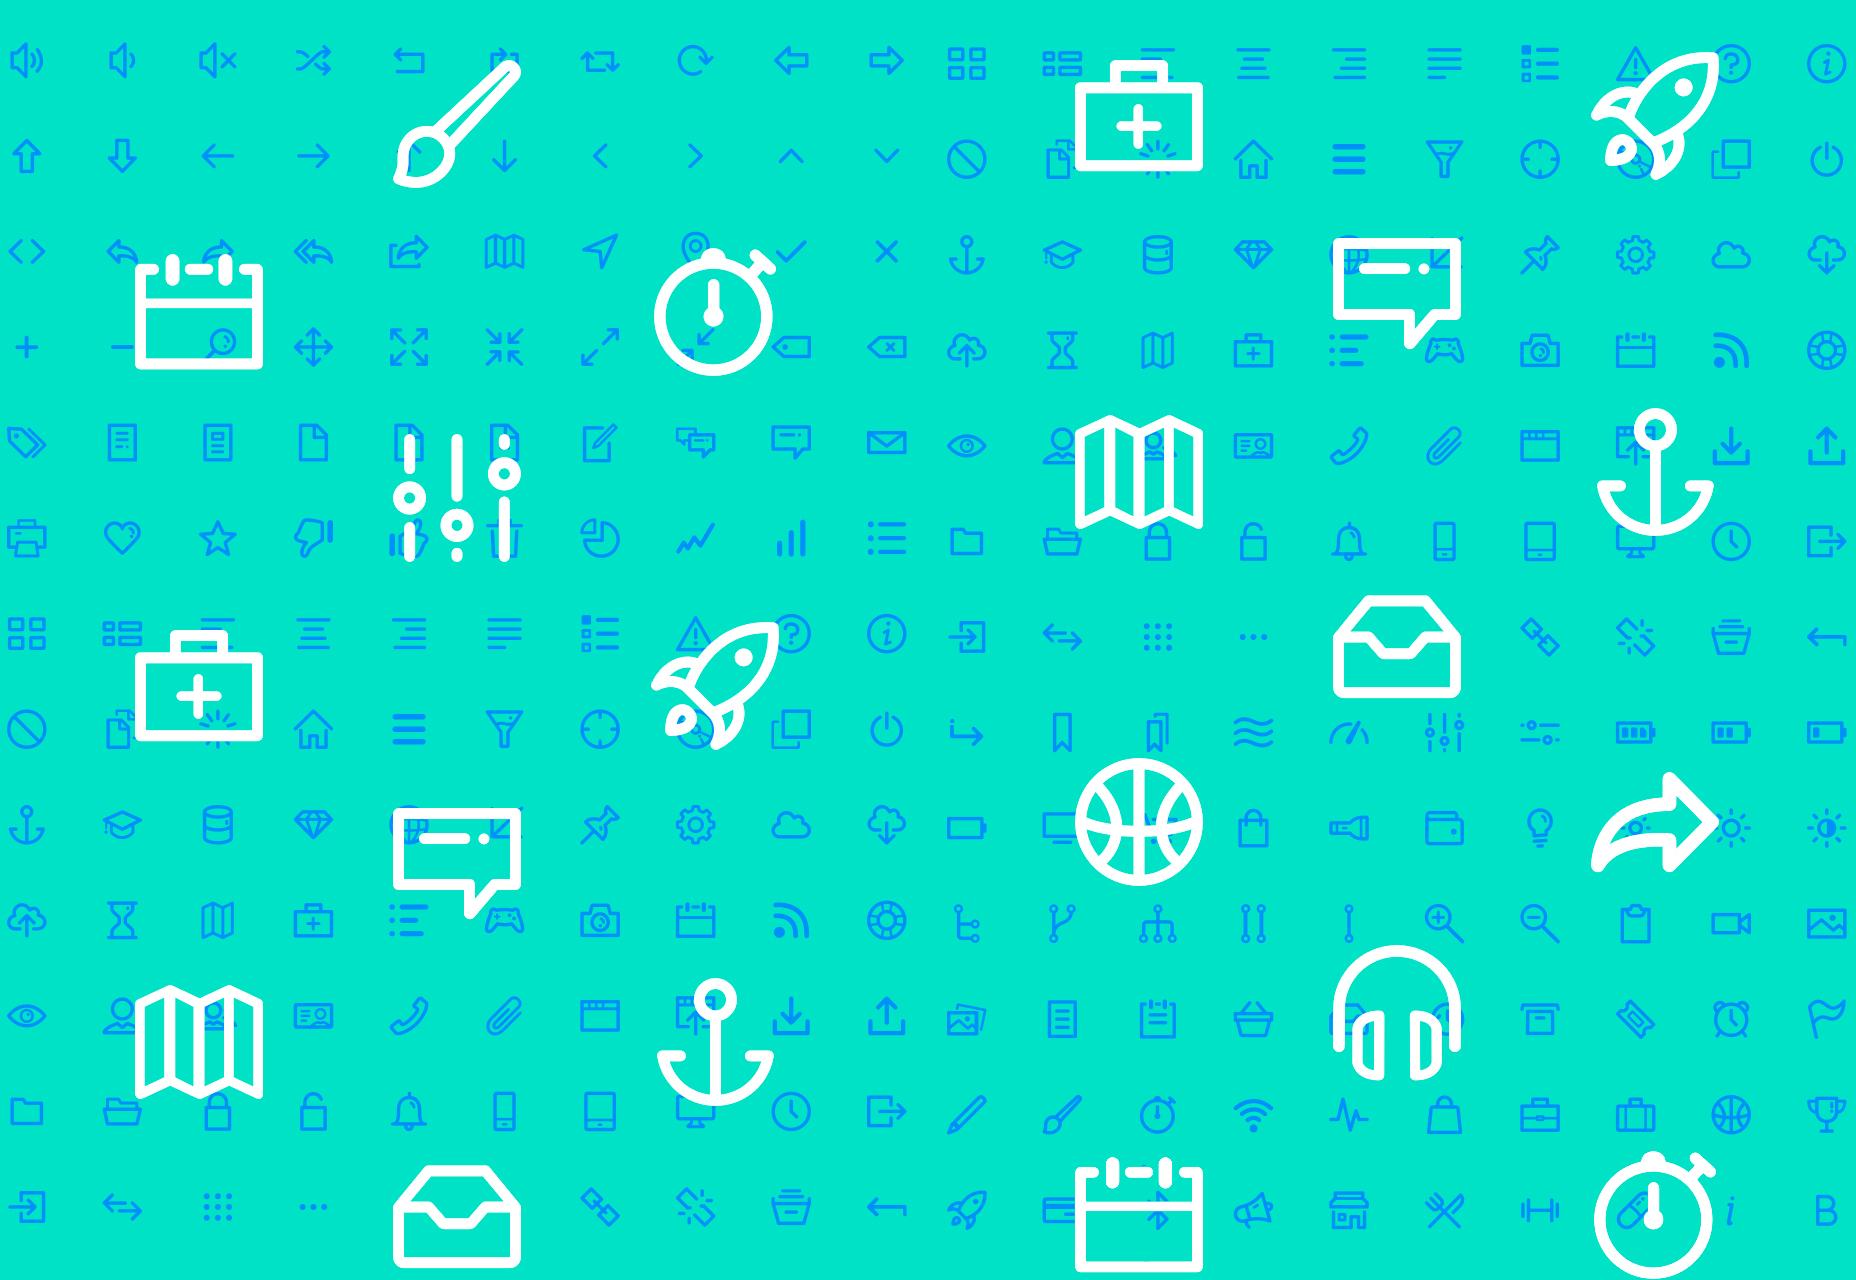 dripicons-v2-amazing-svg-webfont-psd-sketch